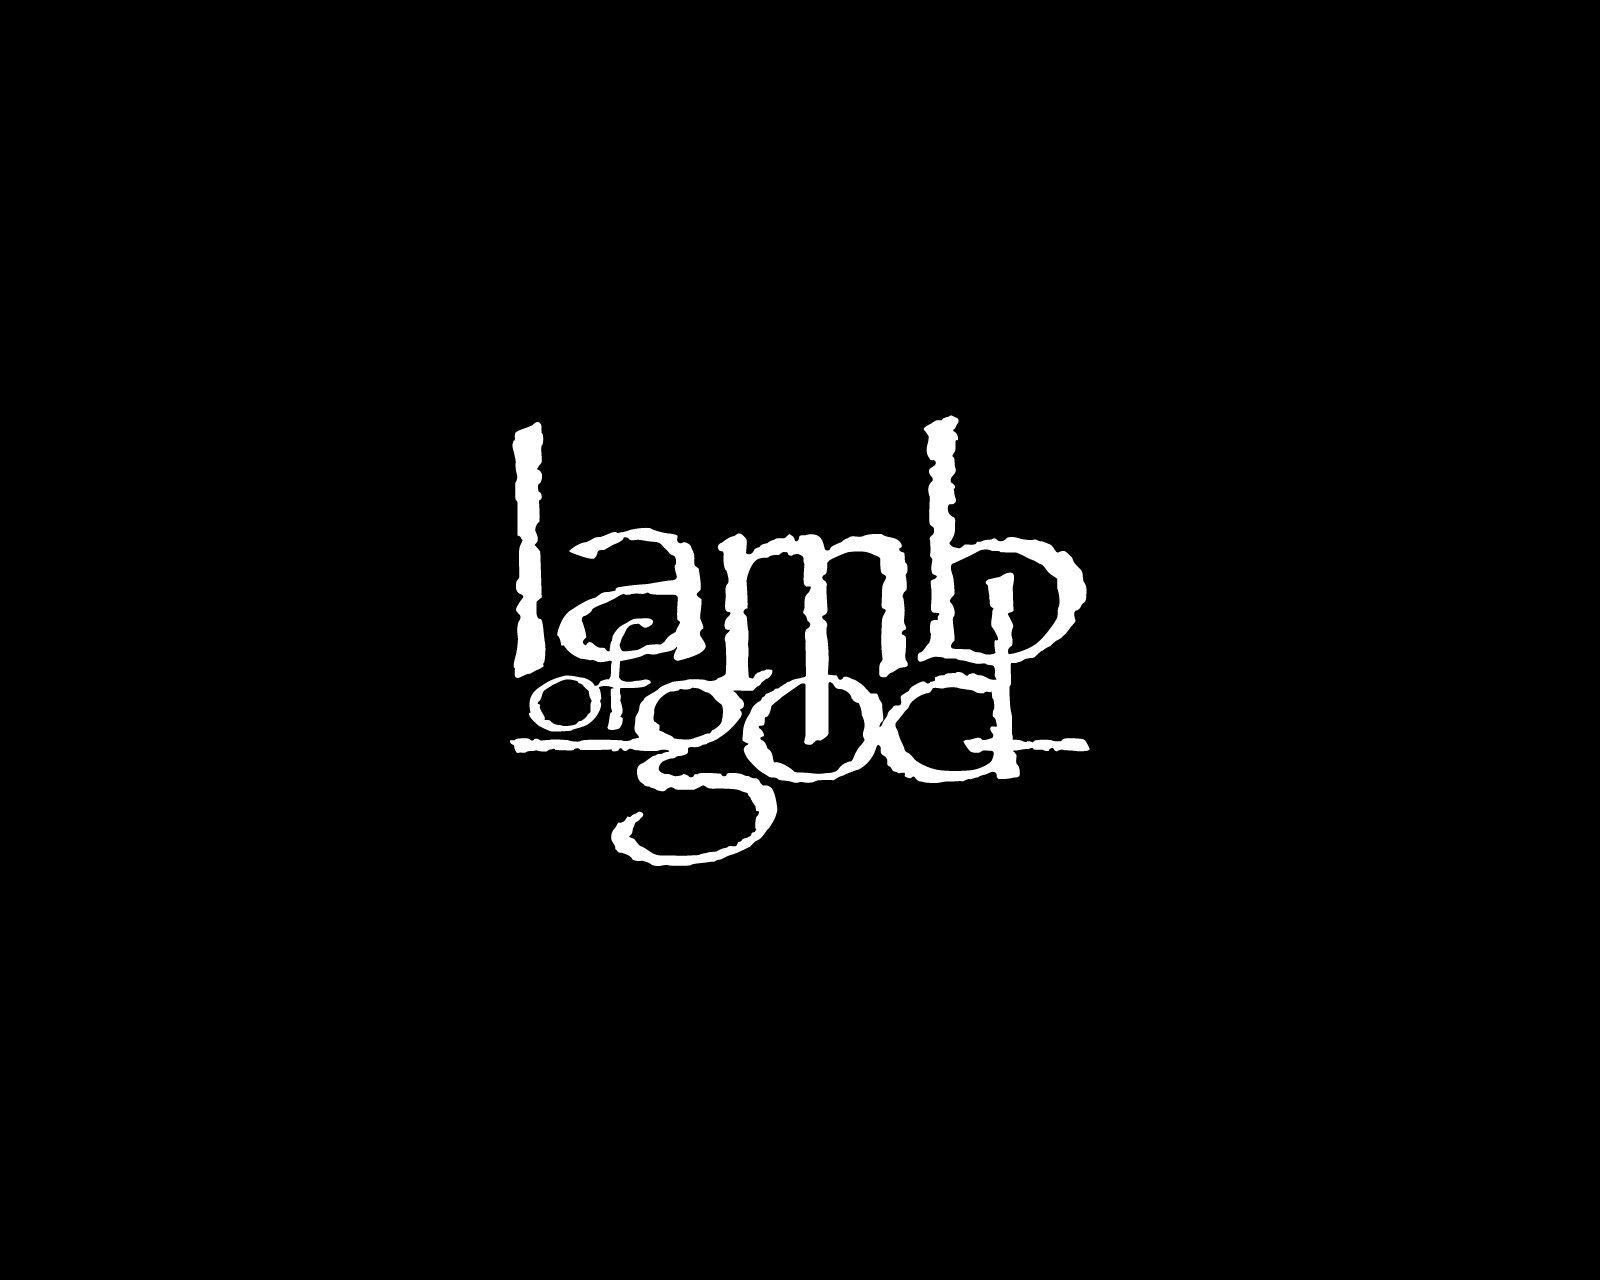 Beautiful Pictures Of Lamb Of God 71 Kb Eugenia Gordon